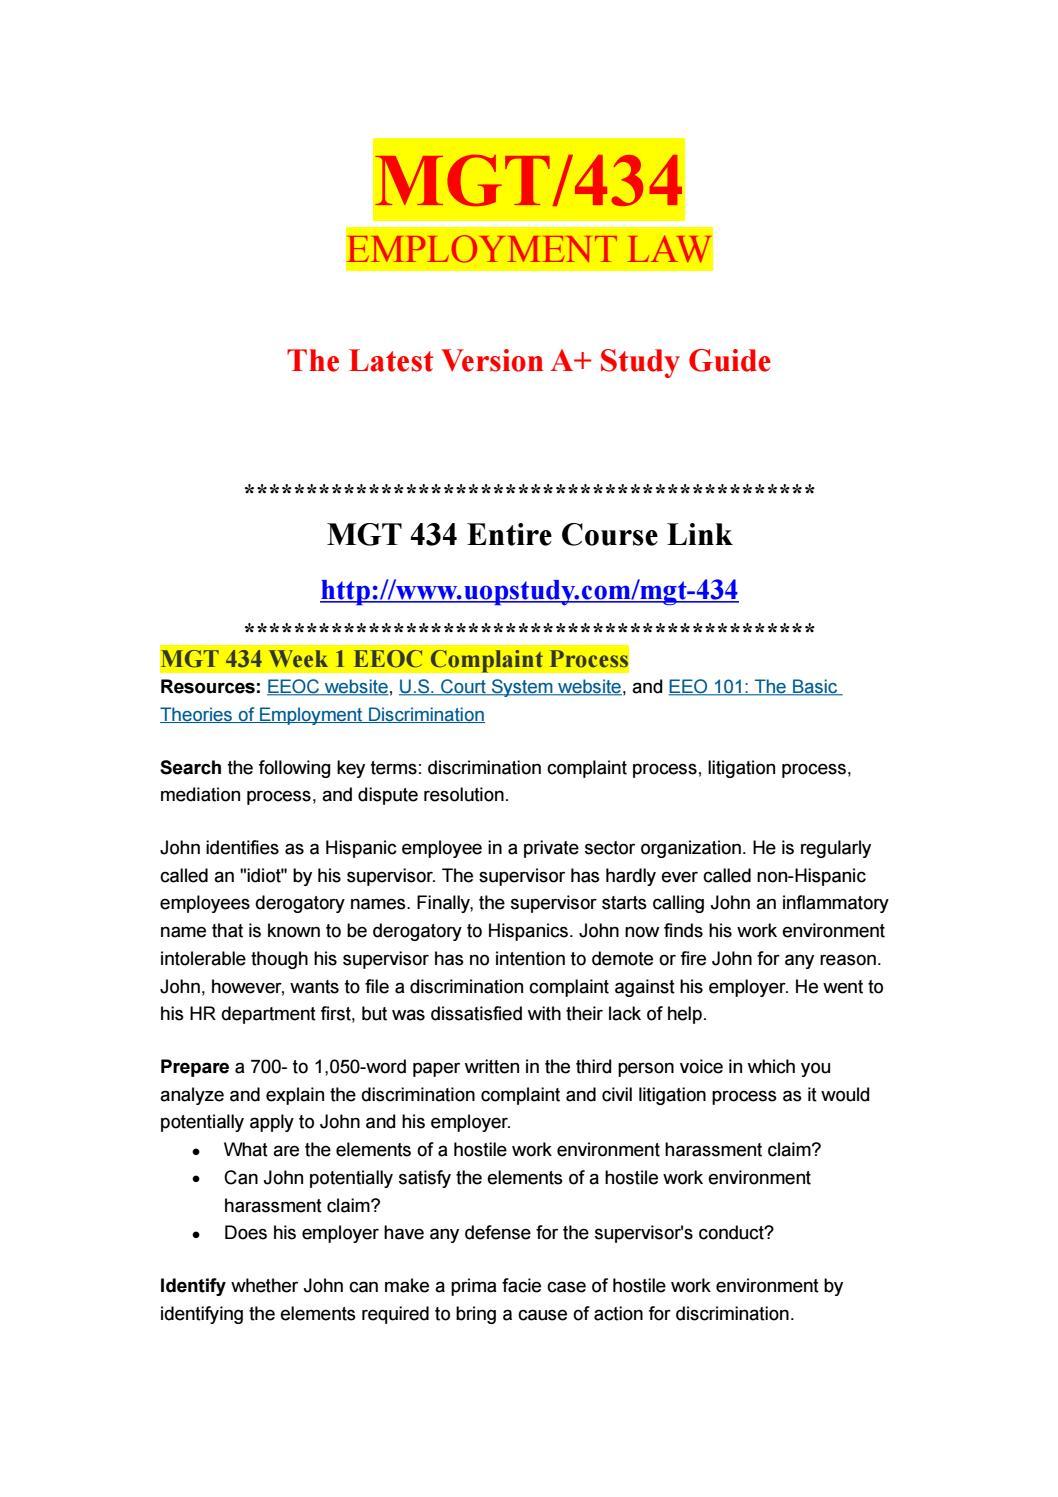 MGT 434 Week 1 EEOC Complaint Process - uopstudy com by